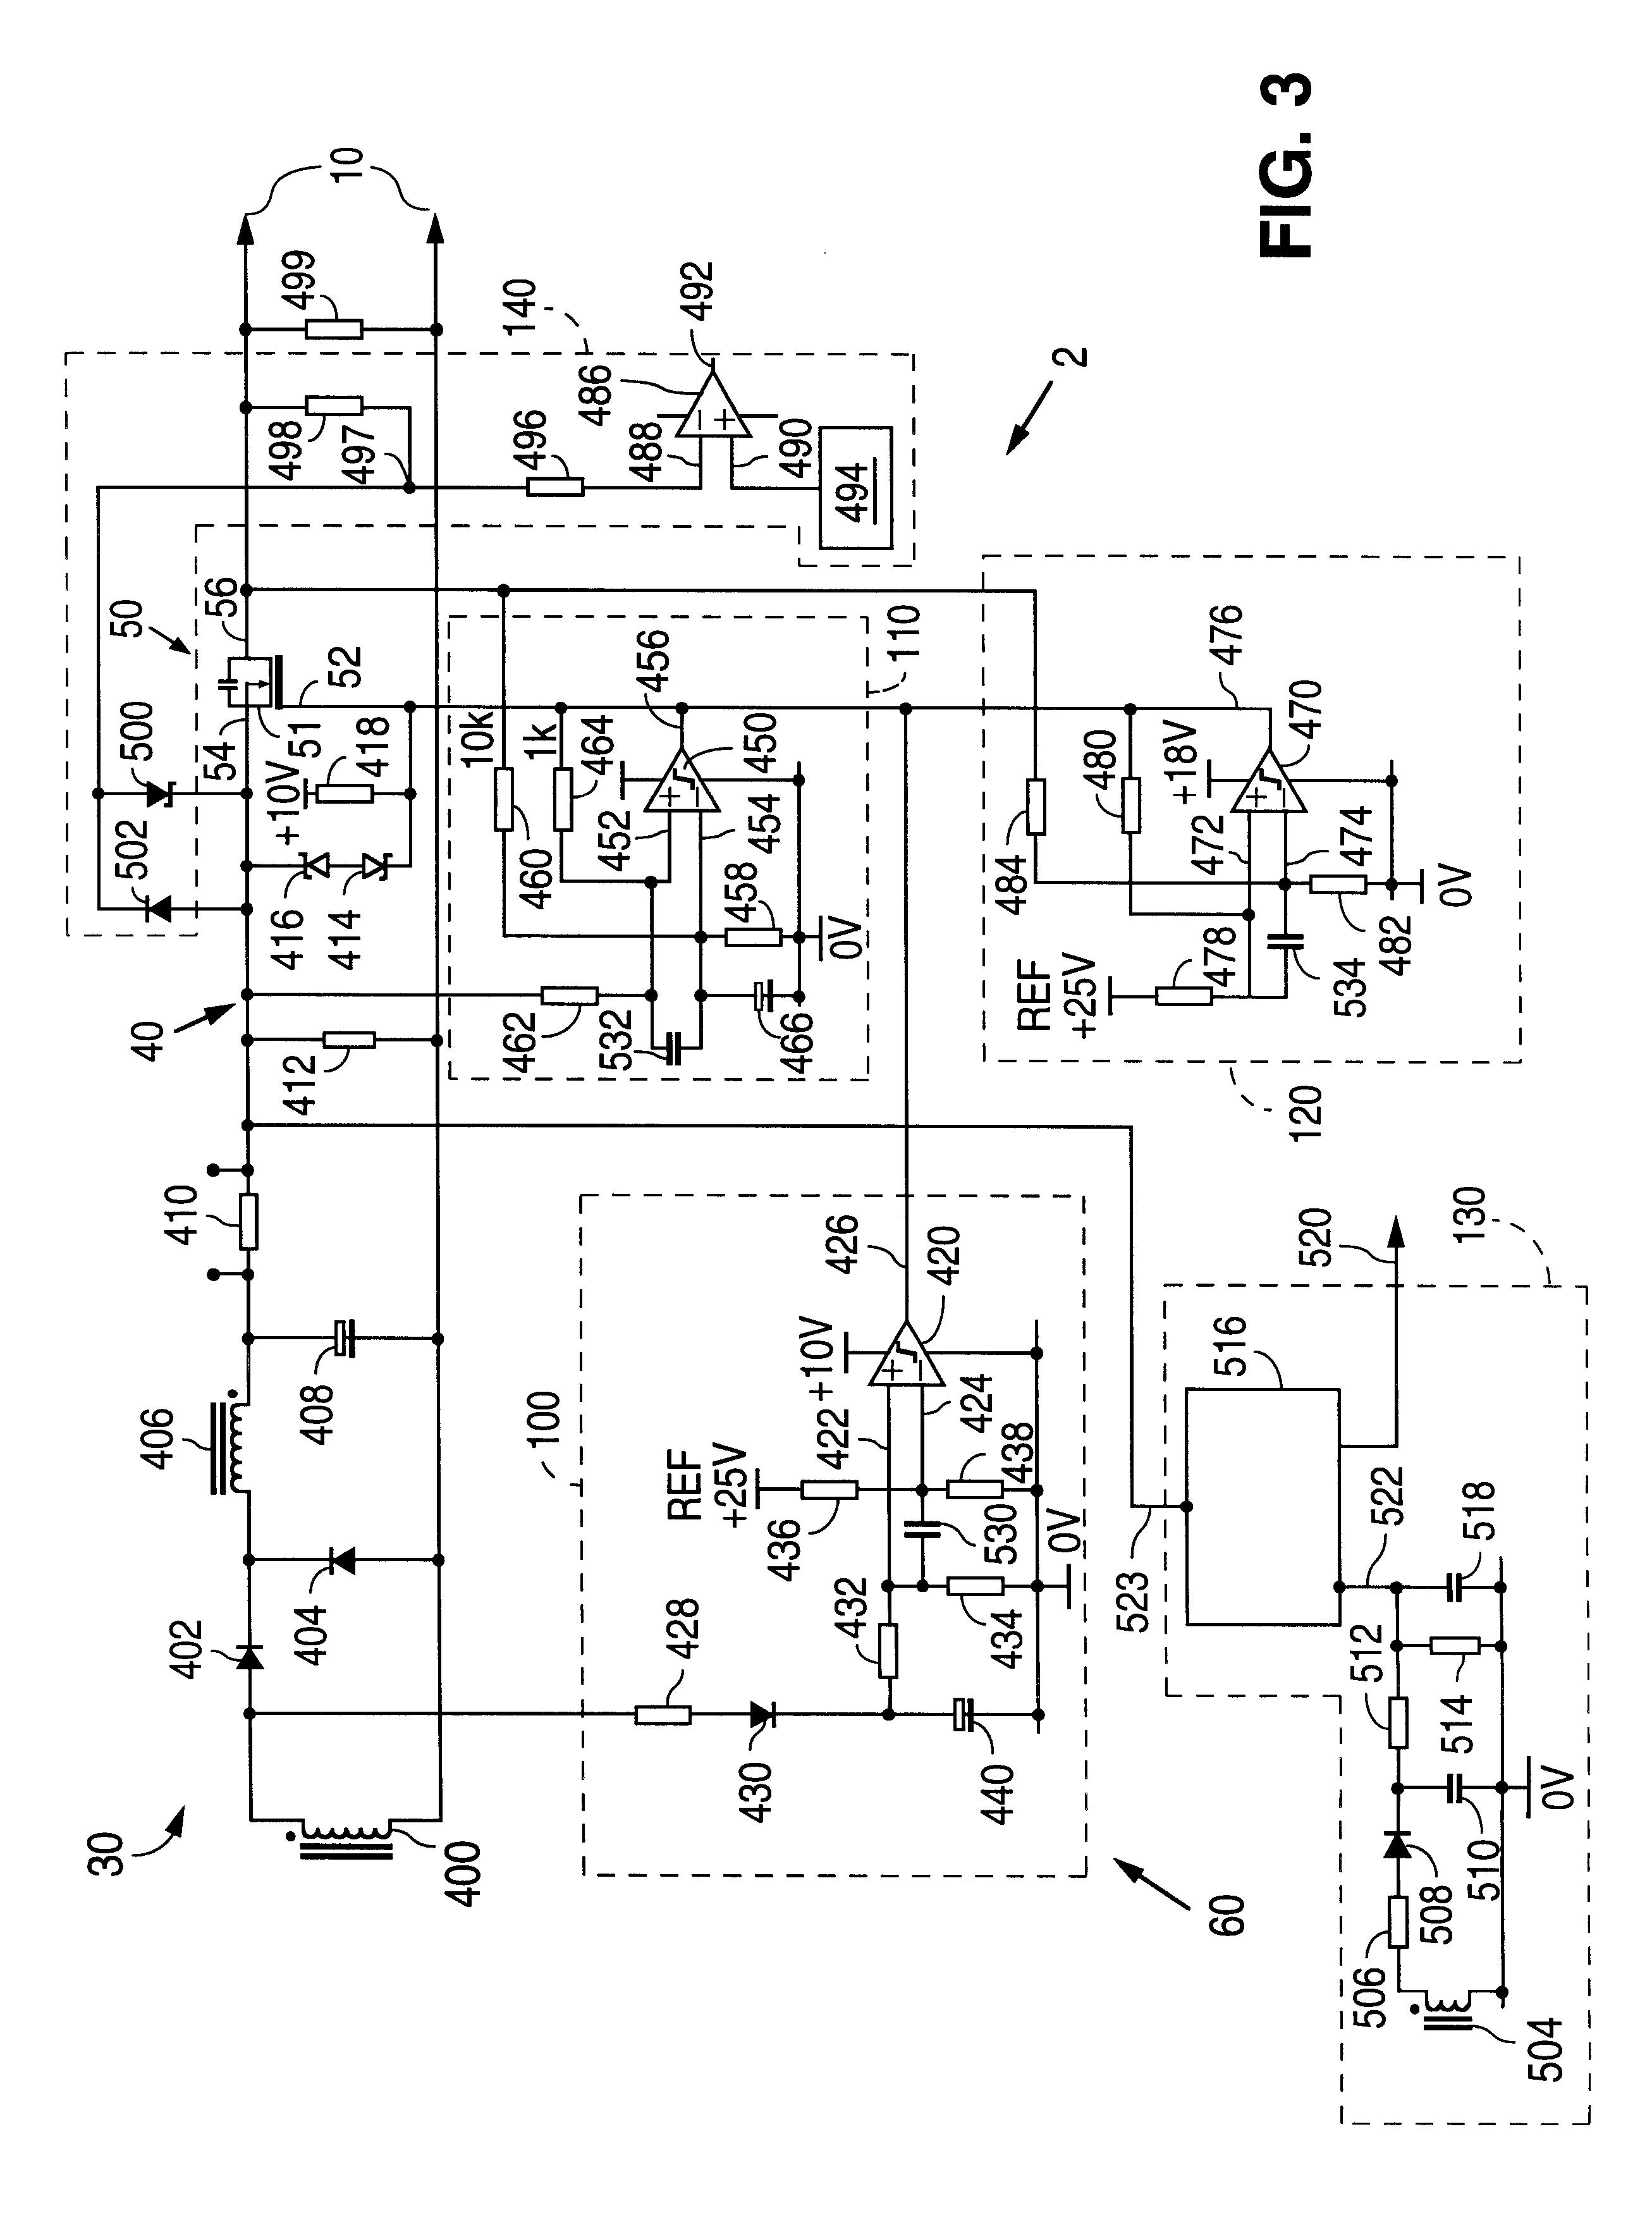 Download in addition YXJ0ZXN5bi1wb3dlci1zdXBwbHktc2NoZW1hdGljcw as well 189622094 Sony Tc 399 Reel To Reel Tape Recorder additionally Clear Glass Sensor Circuit in addition 261. on wiring schematics